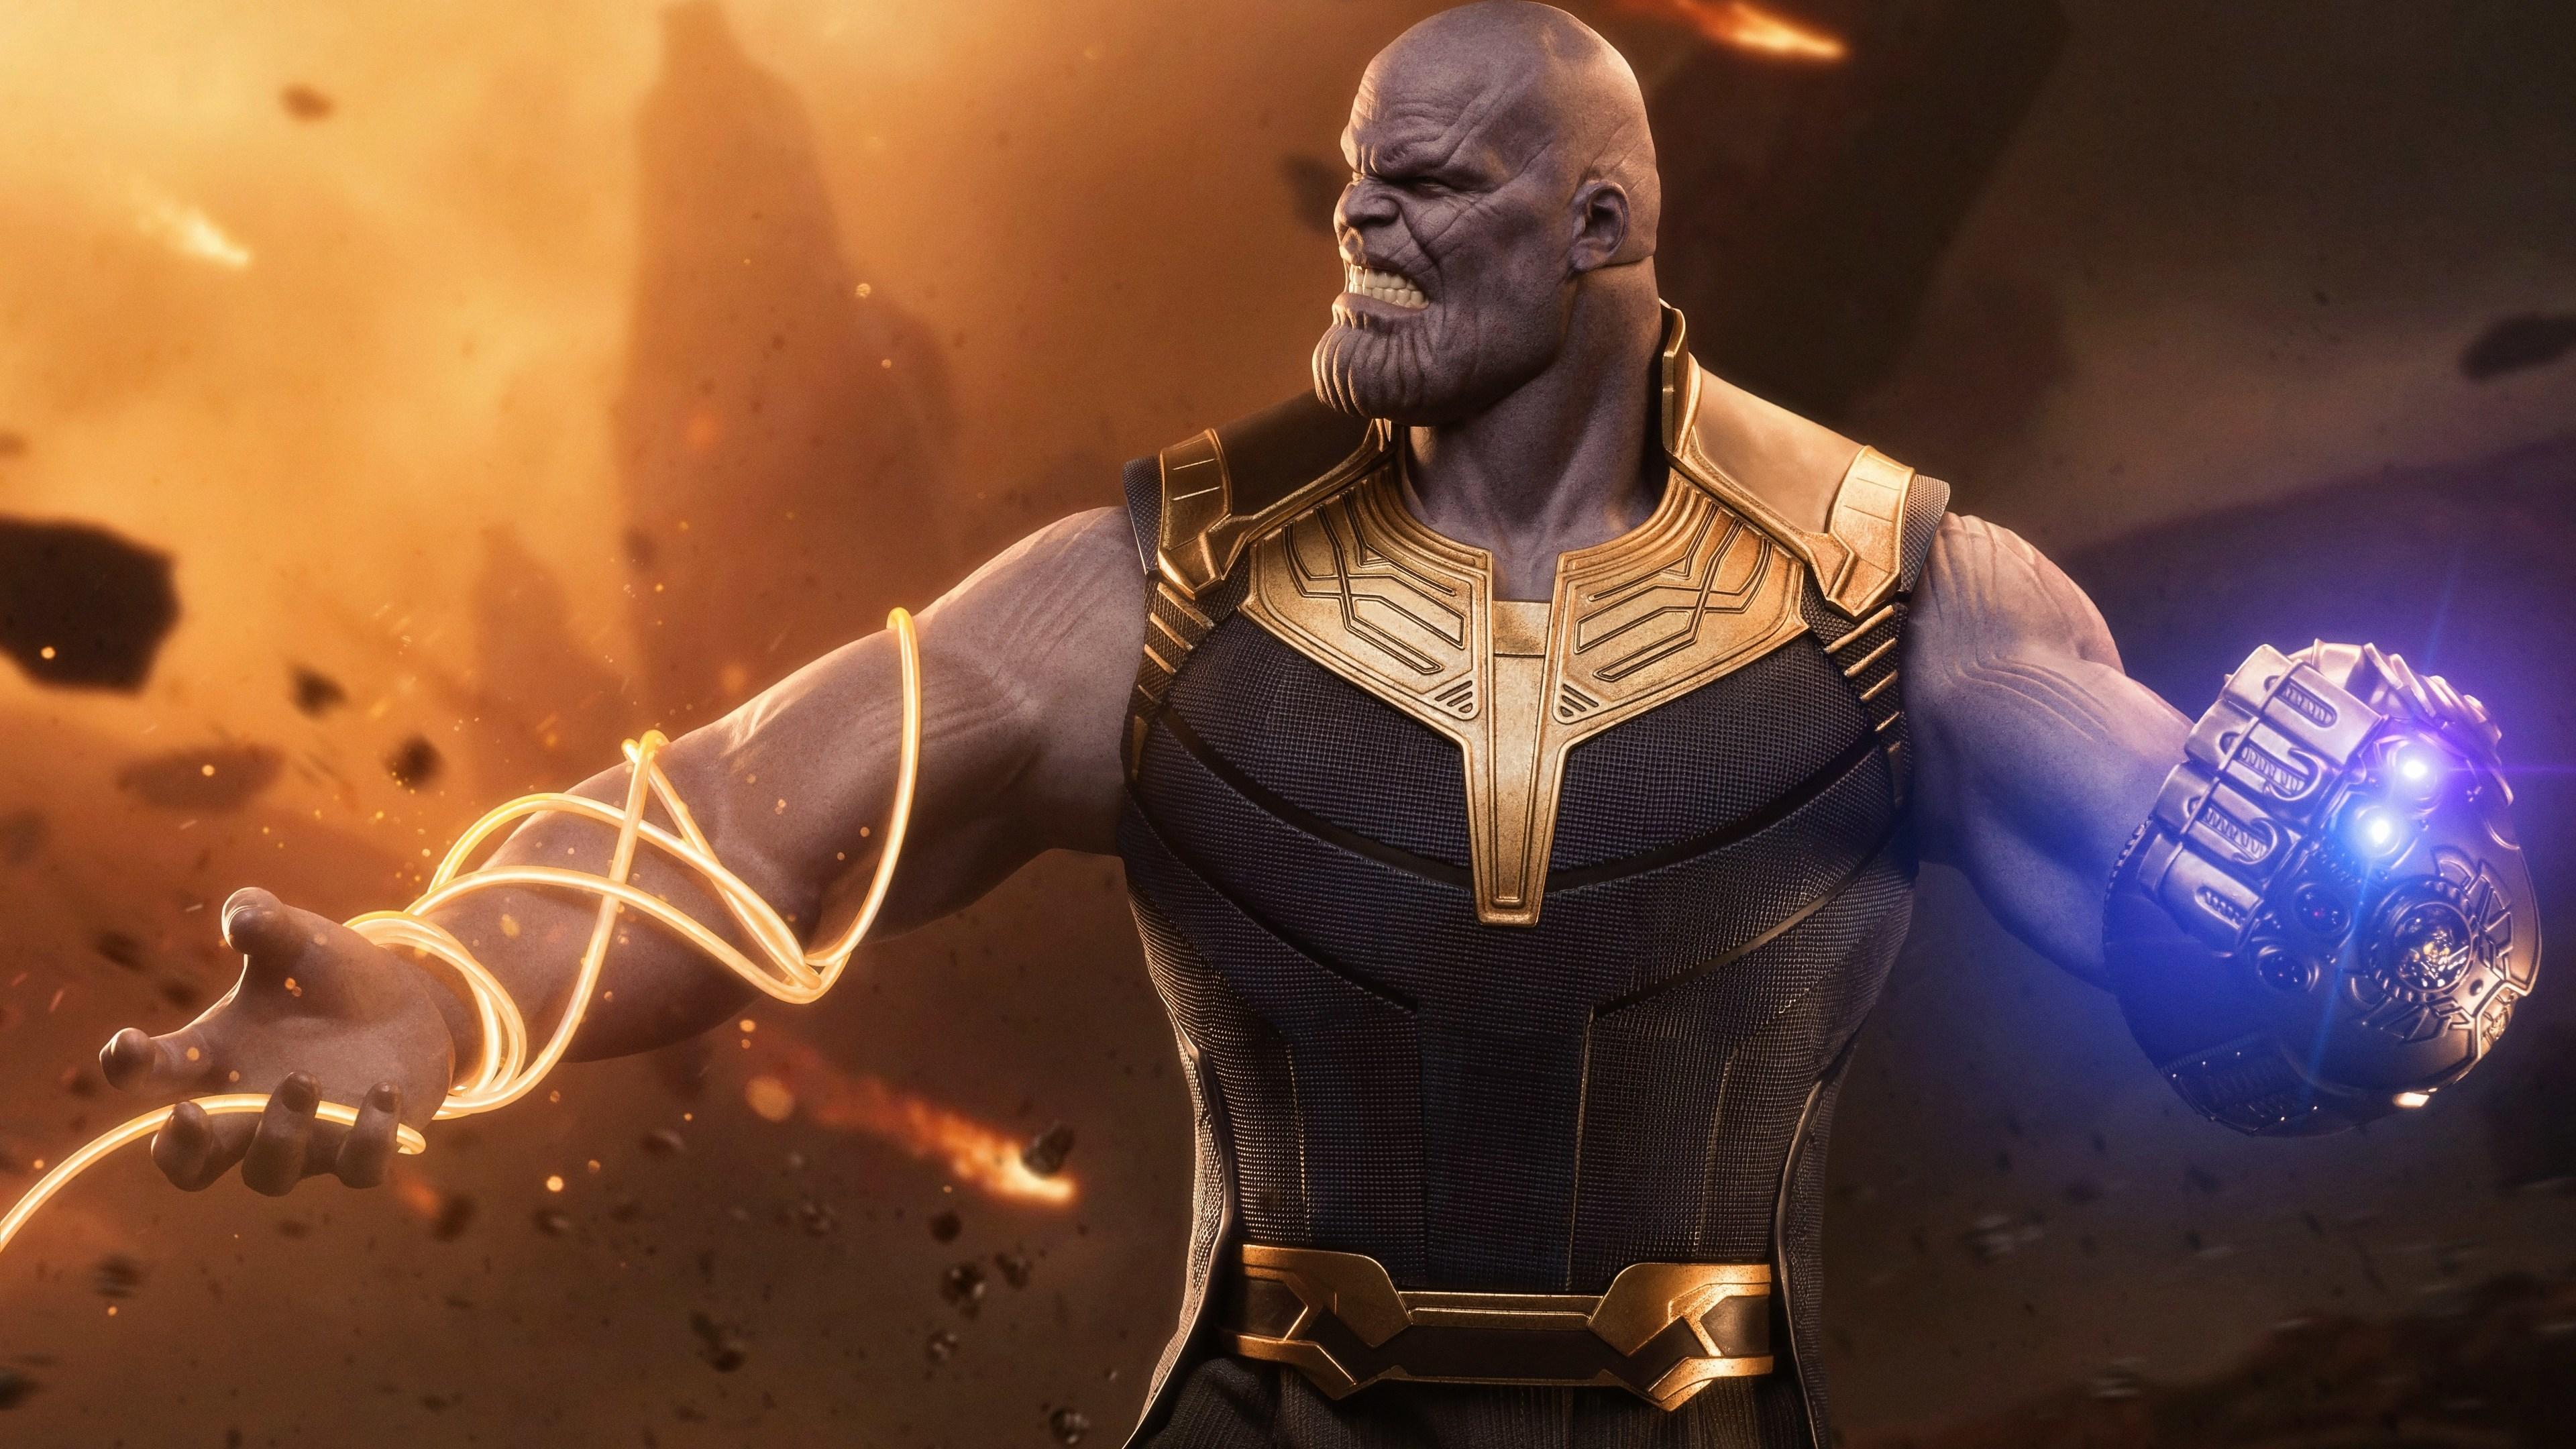 thanos supervillain 4k 1553071719 - Thanos Supervillain 4k - thanos-wallpapers, supervillain wallpapers, superheroes wallpapers, hd-wallpapers, 5k wallpapers, 4k-wallpapers